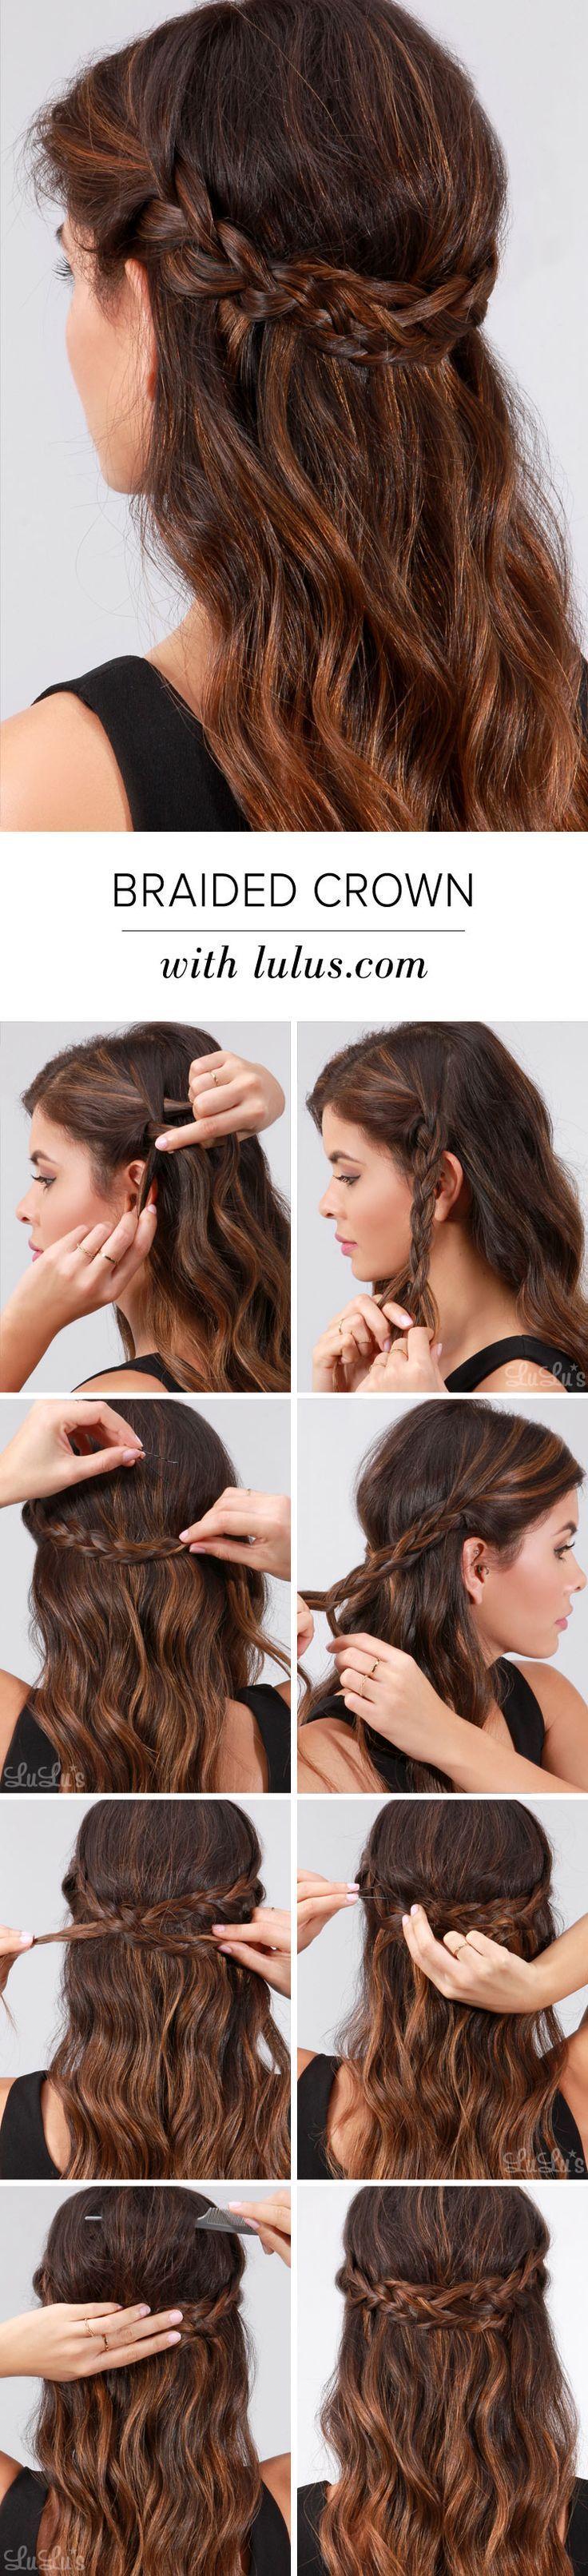 100 Super Easy DIY Braided Hairstyles for Wedding Tutorials